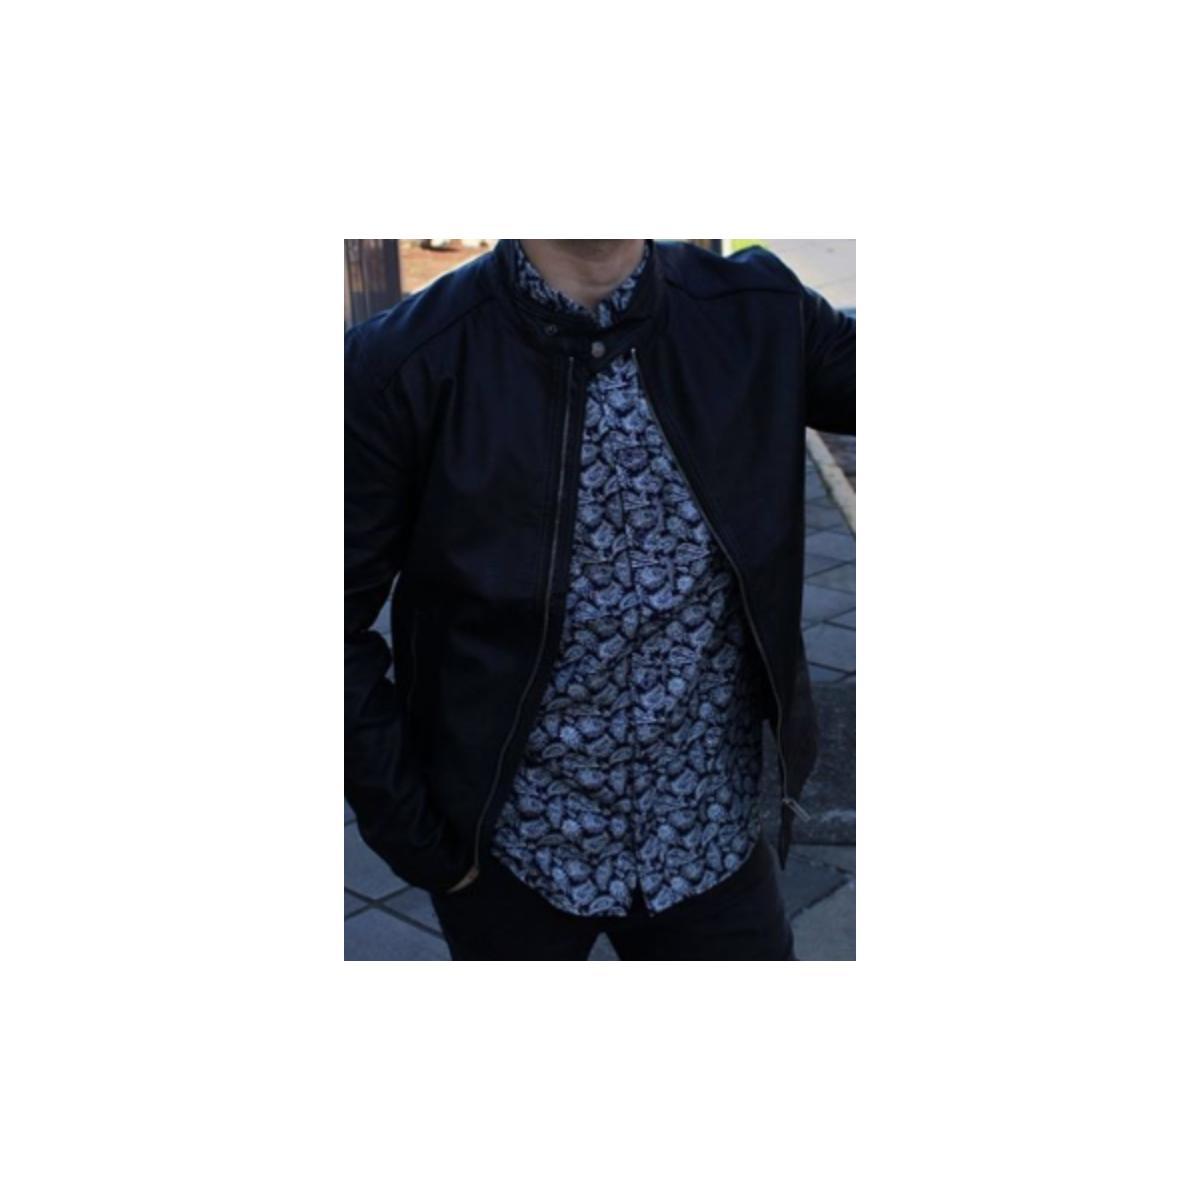 Camisa Masculina Cavalera Clothing 02.01.1577 Marinho Estampado